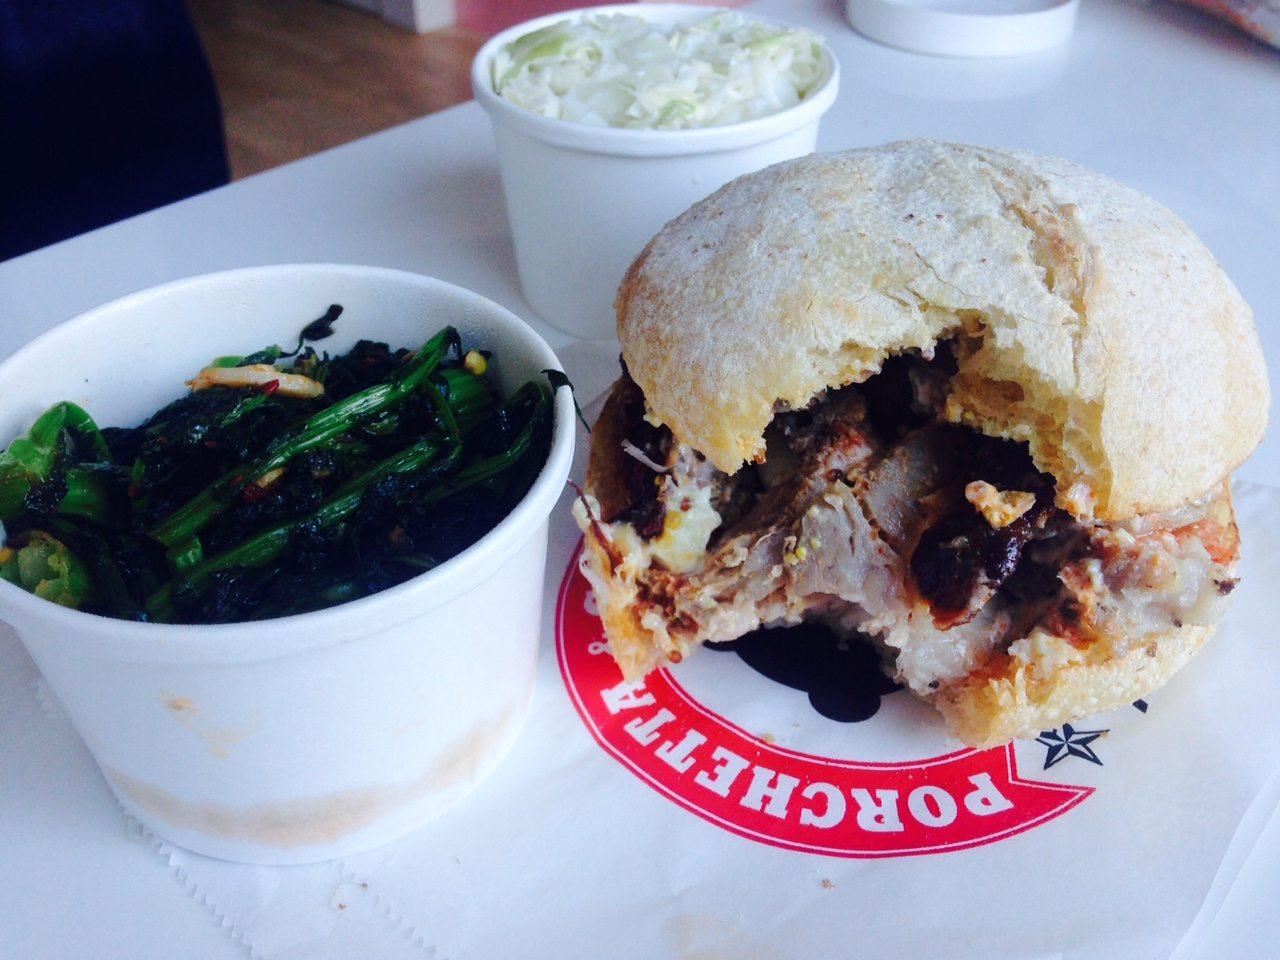 toronto-chefs-restaurants-consumed-bob-blumer-food-network-surreal-gourmet-porchetta-and-co